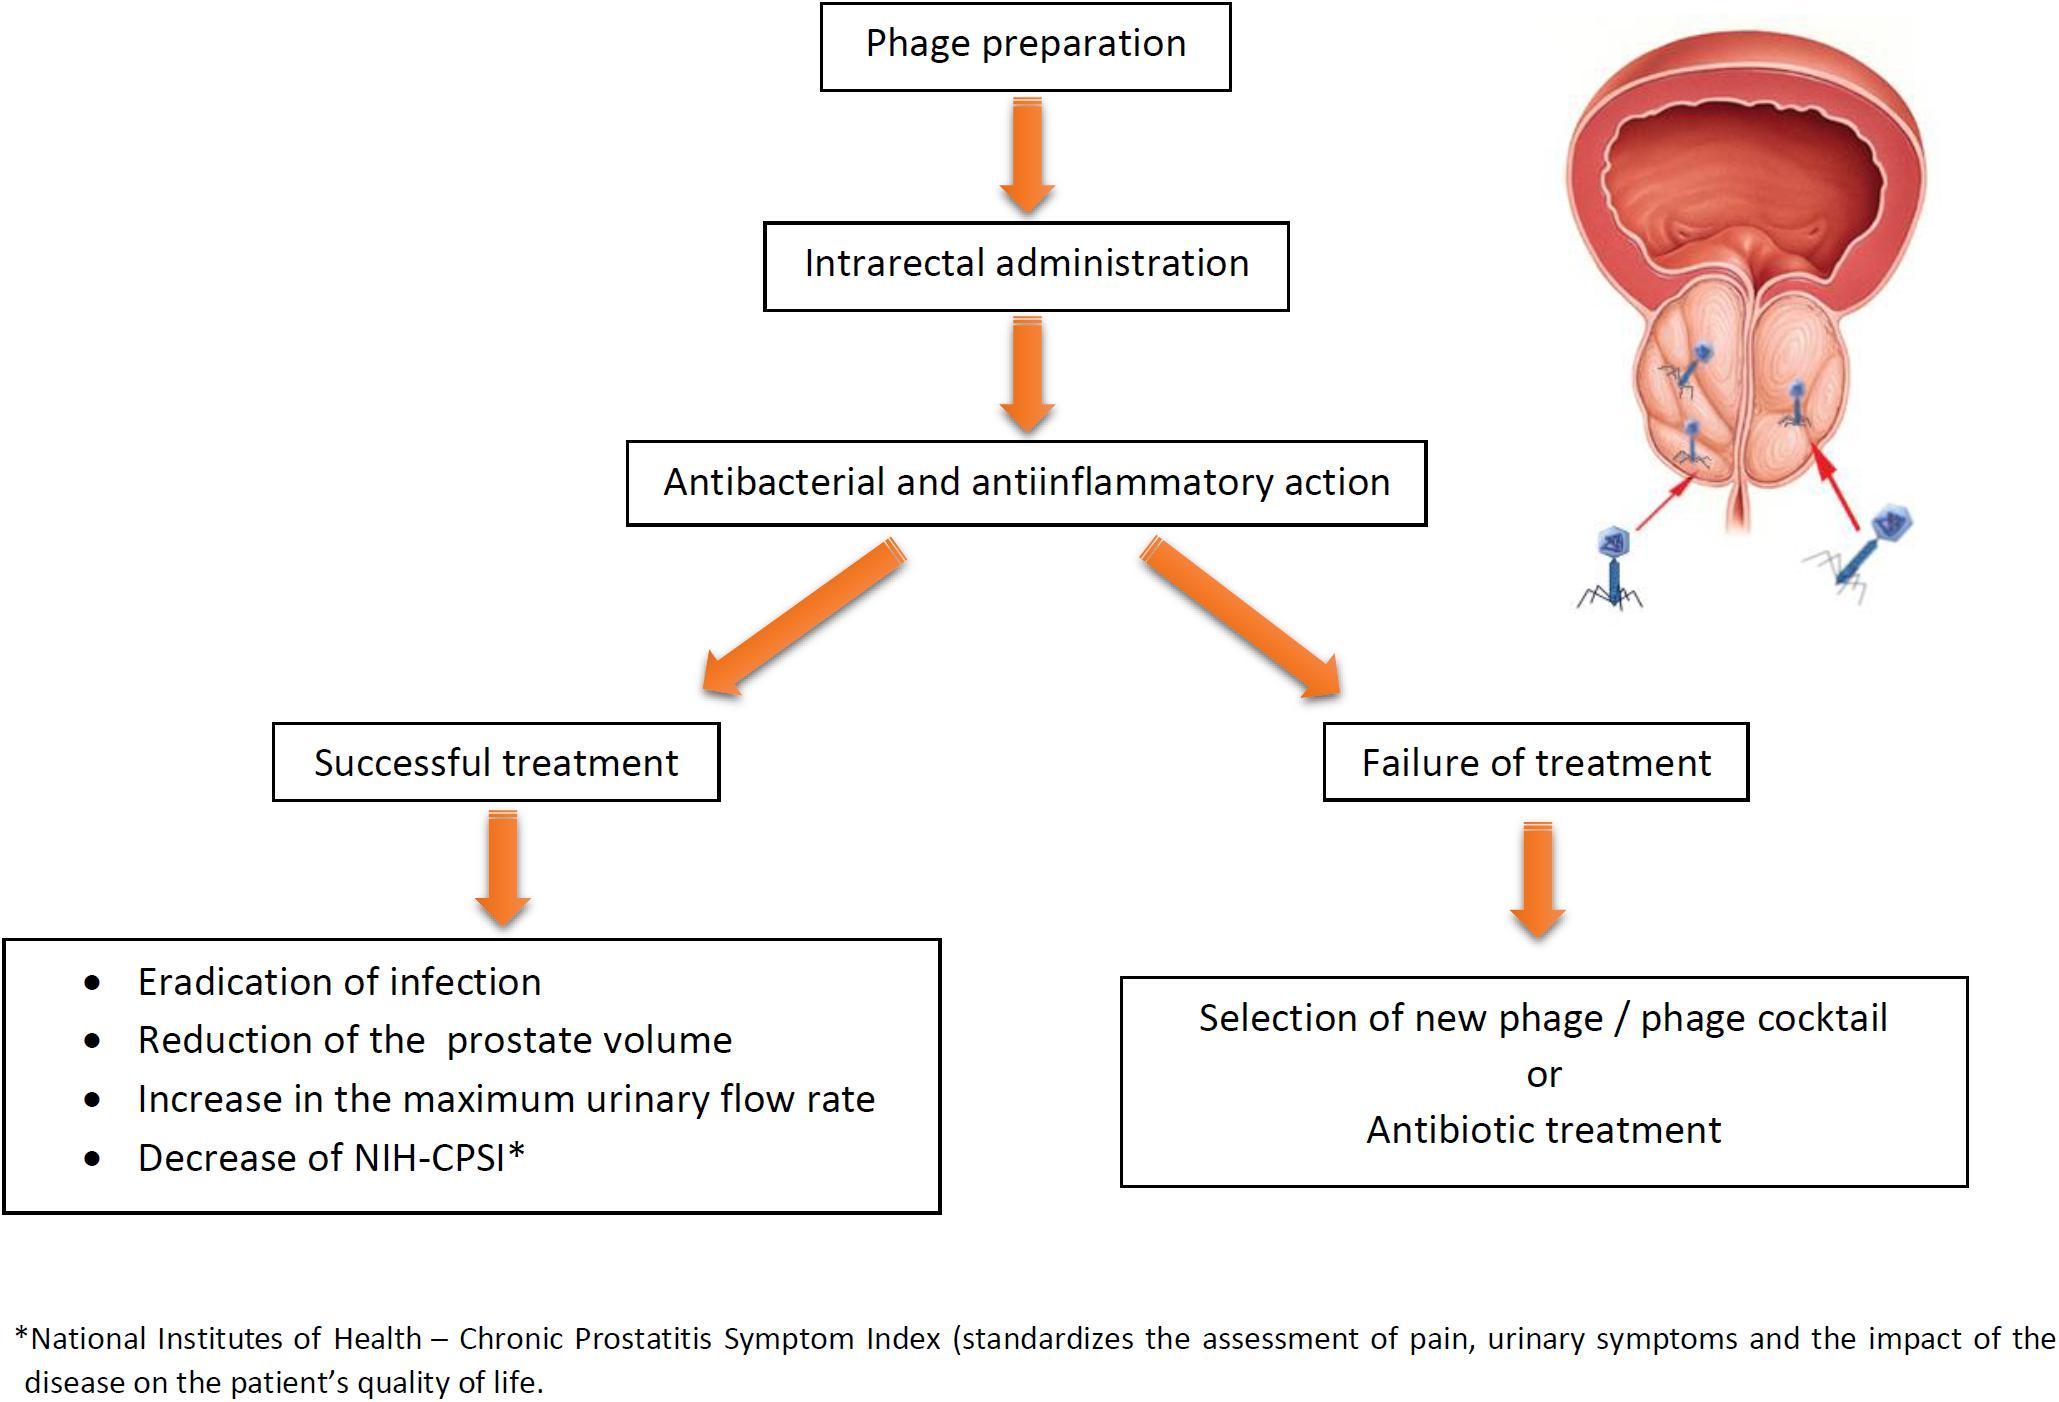 Es una prostatitis no bacteriana curable